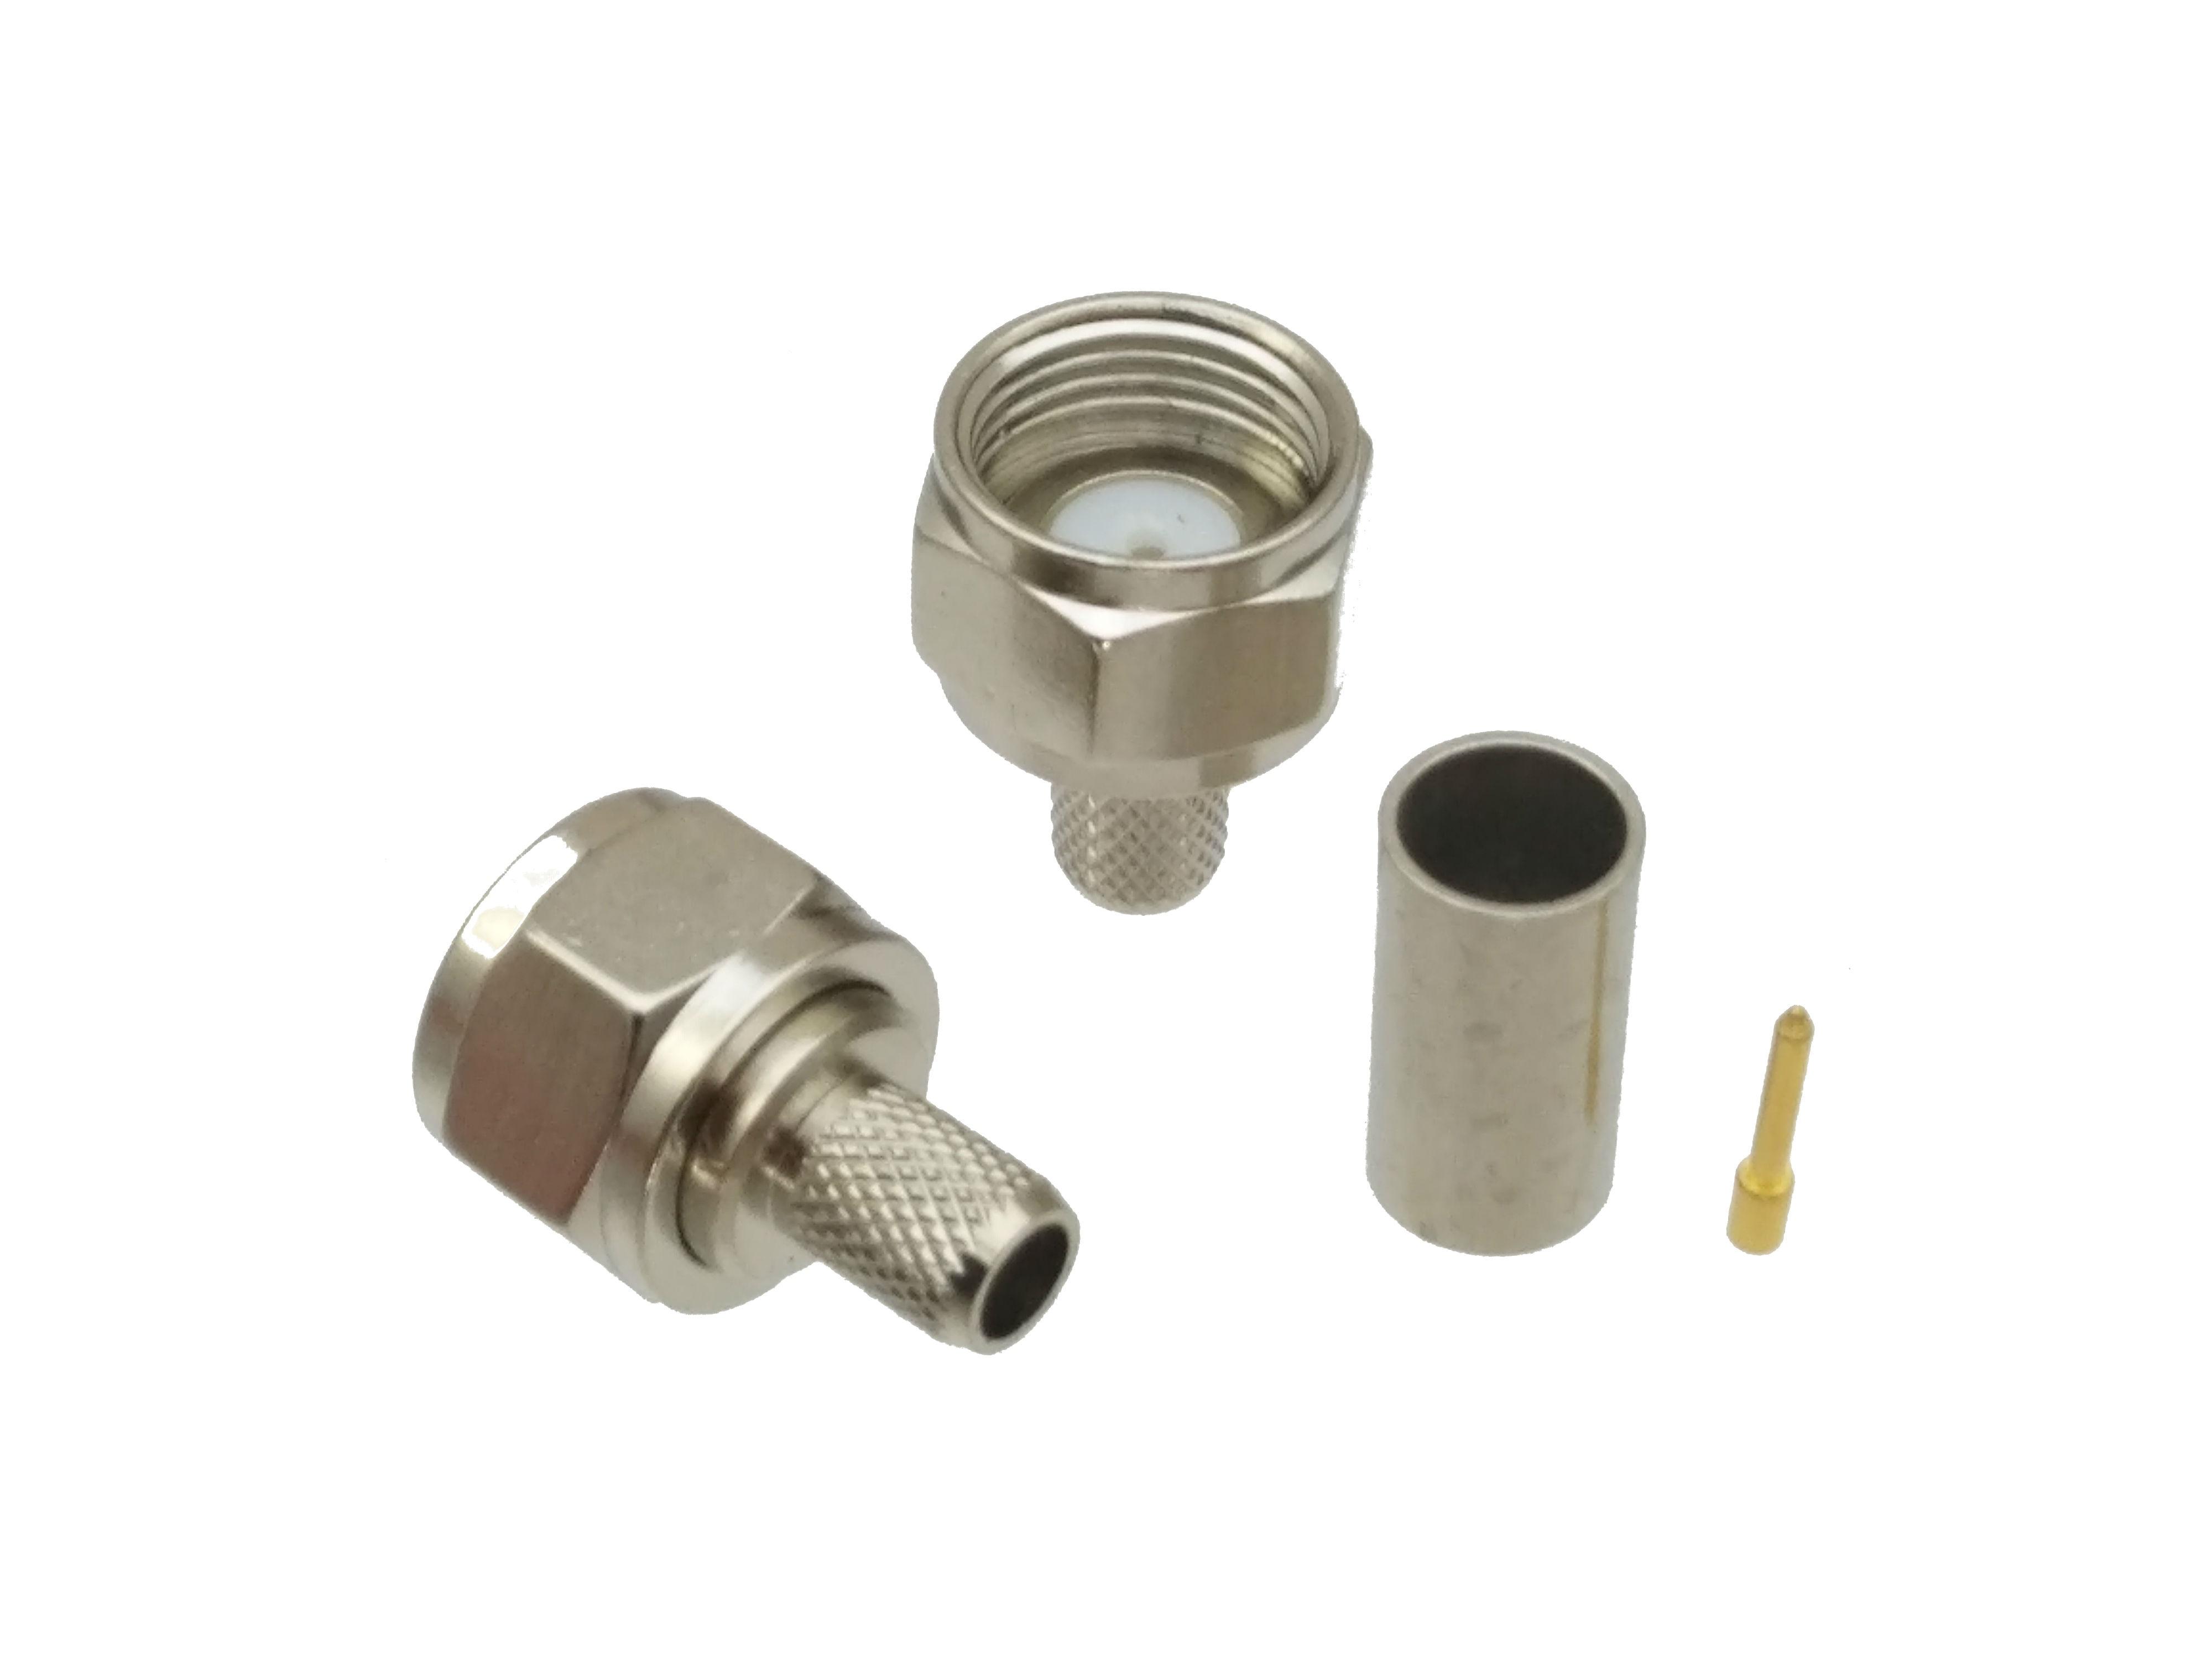 F TV Male Plug Straight Crimp RG58 LMR195 RG142 RG400 Cable RF Connector